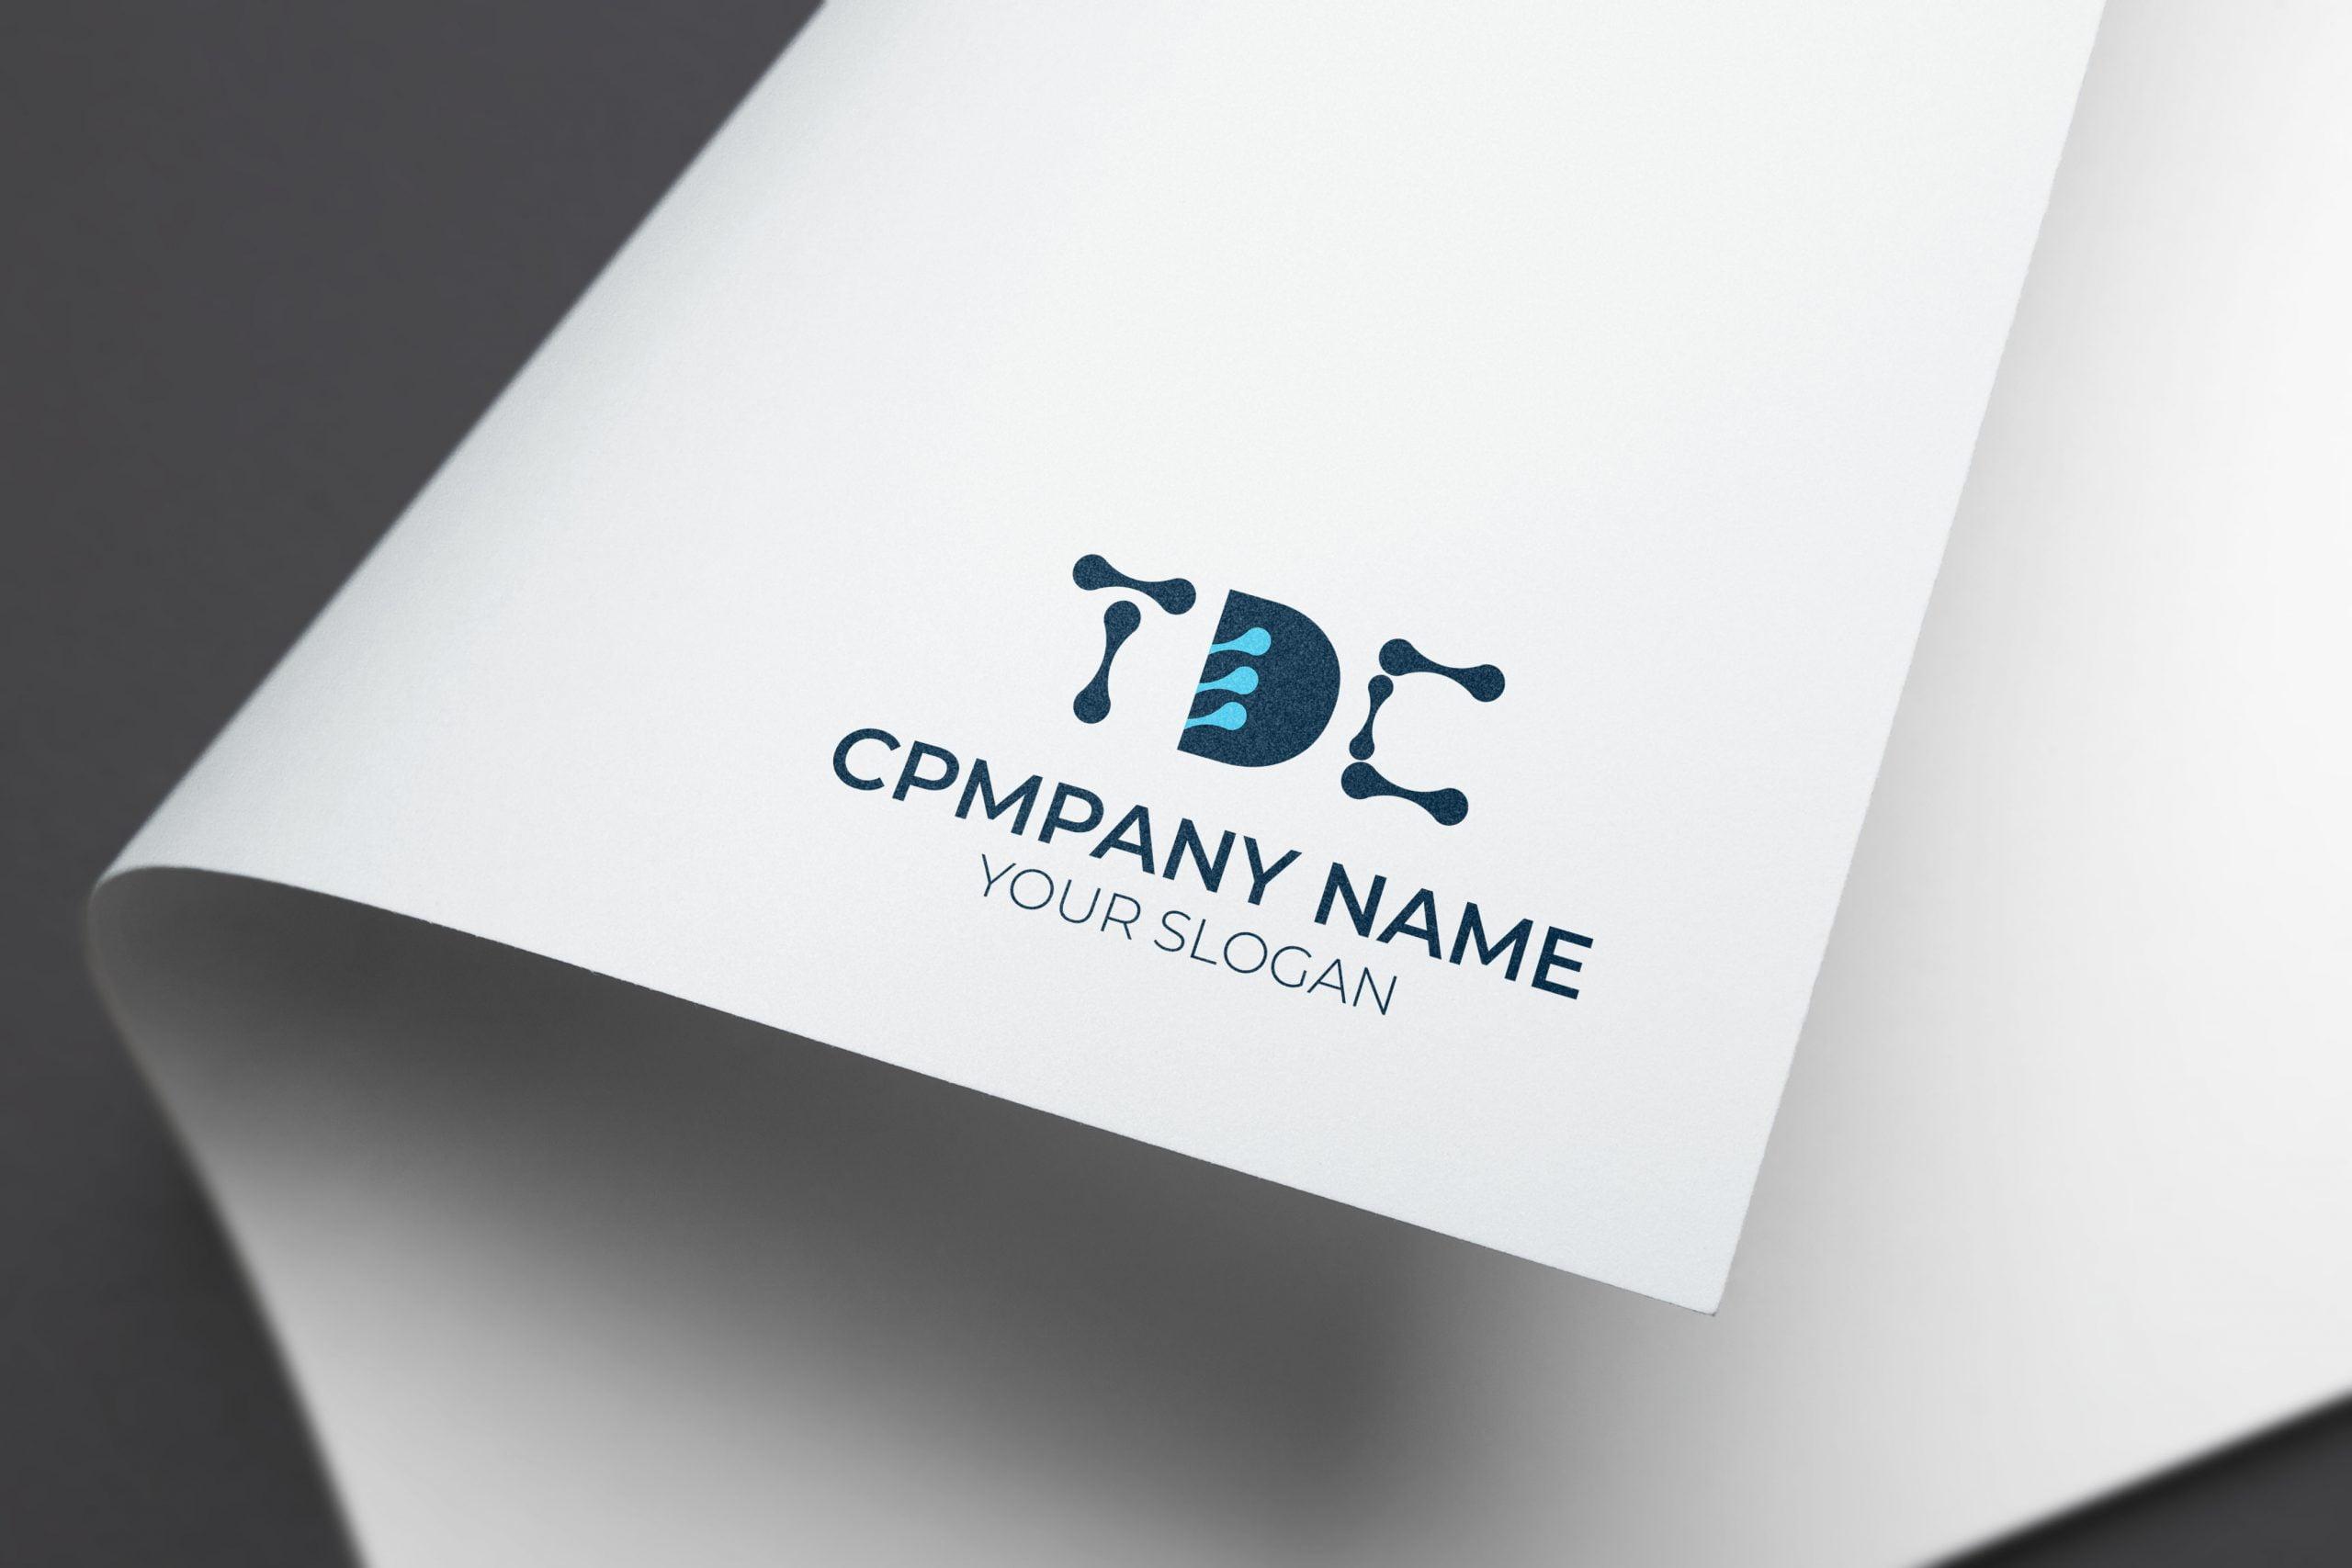 tdc tech logo on paper mockup